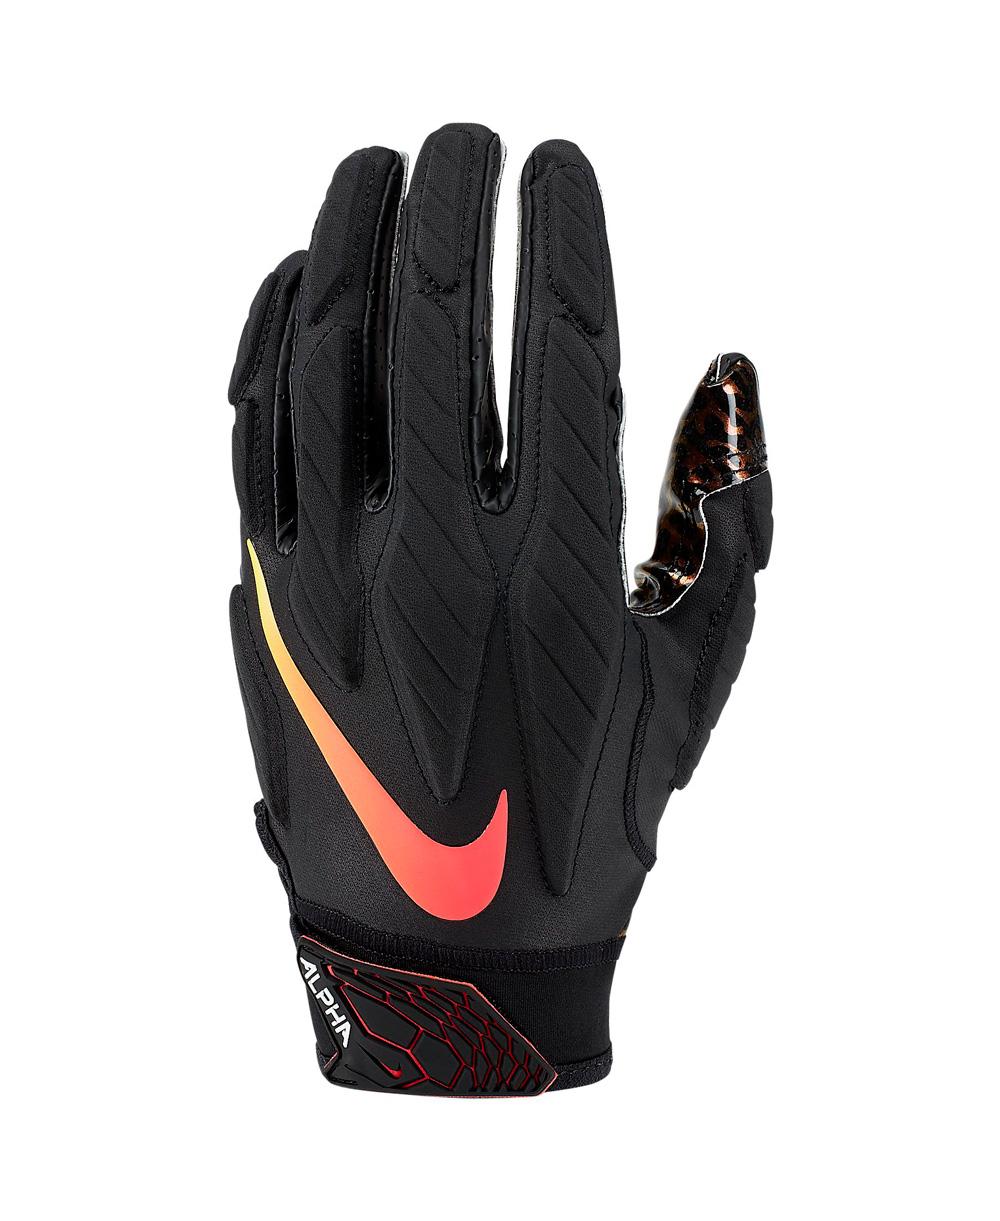 Superbad 5.0 Men's Football Gloves Black/Camo